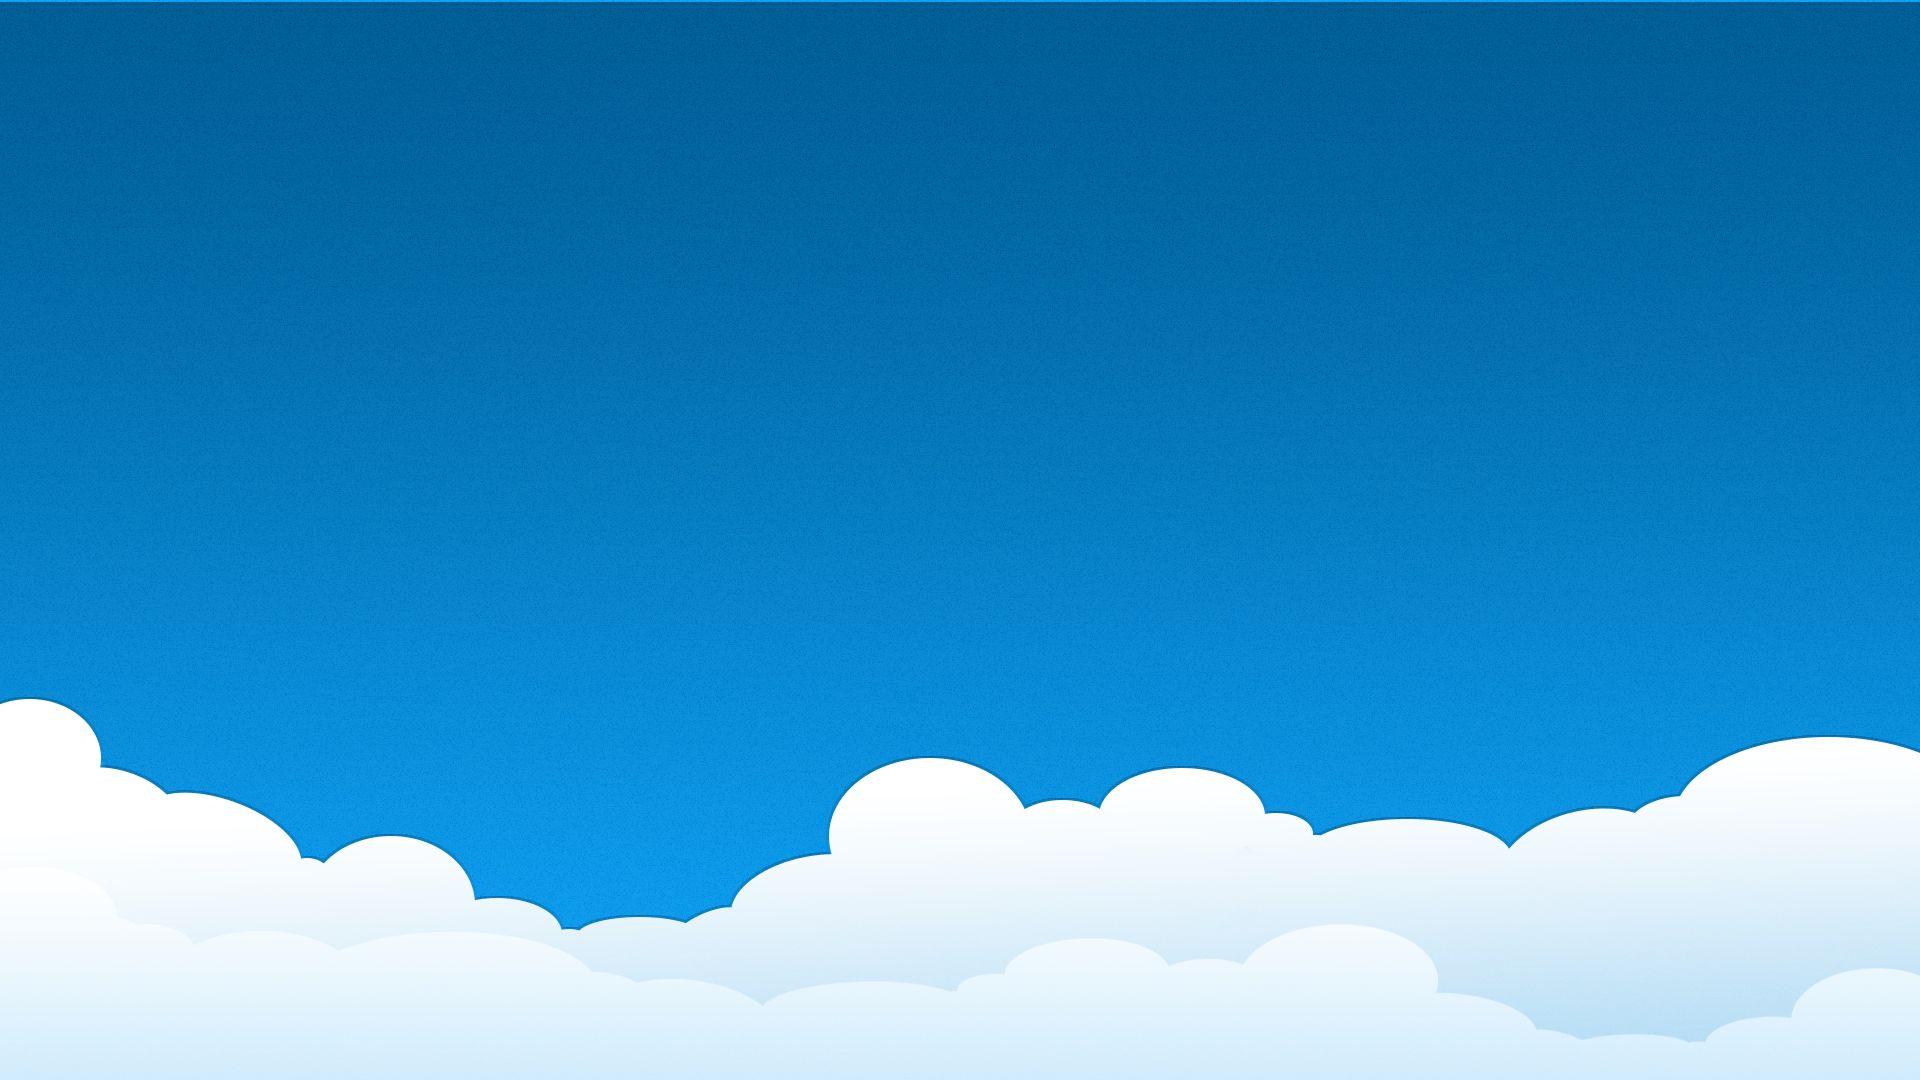 Sky Vector wallpaper for laptop